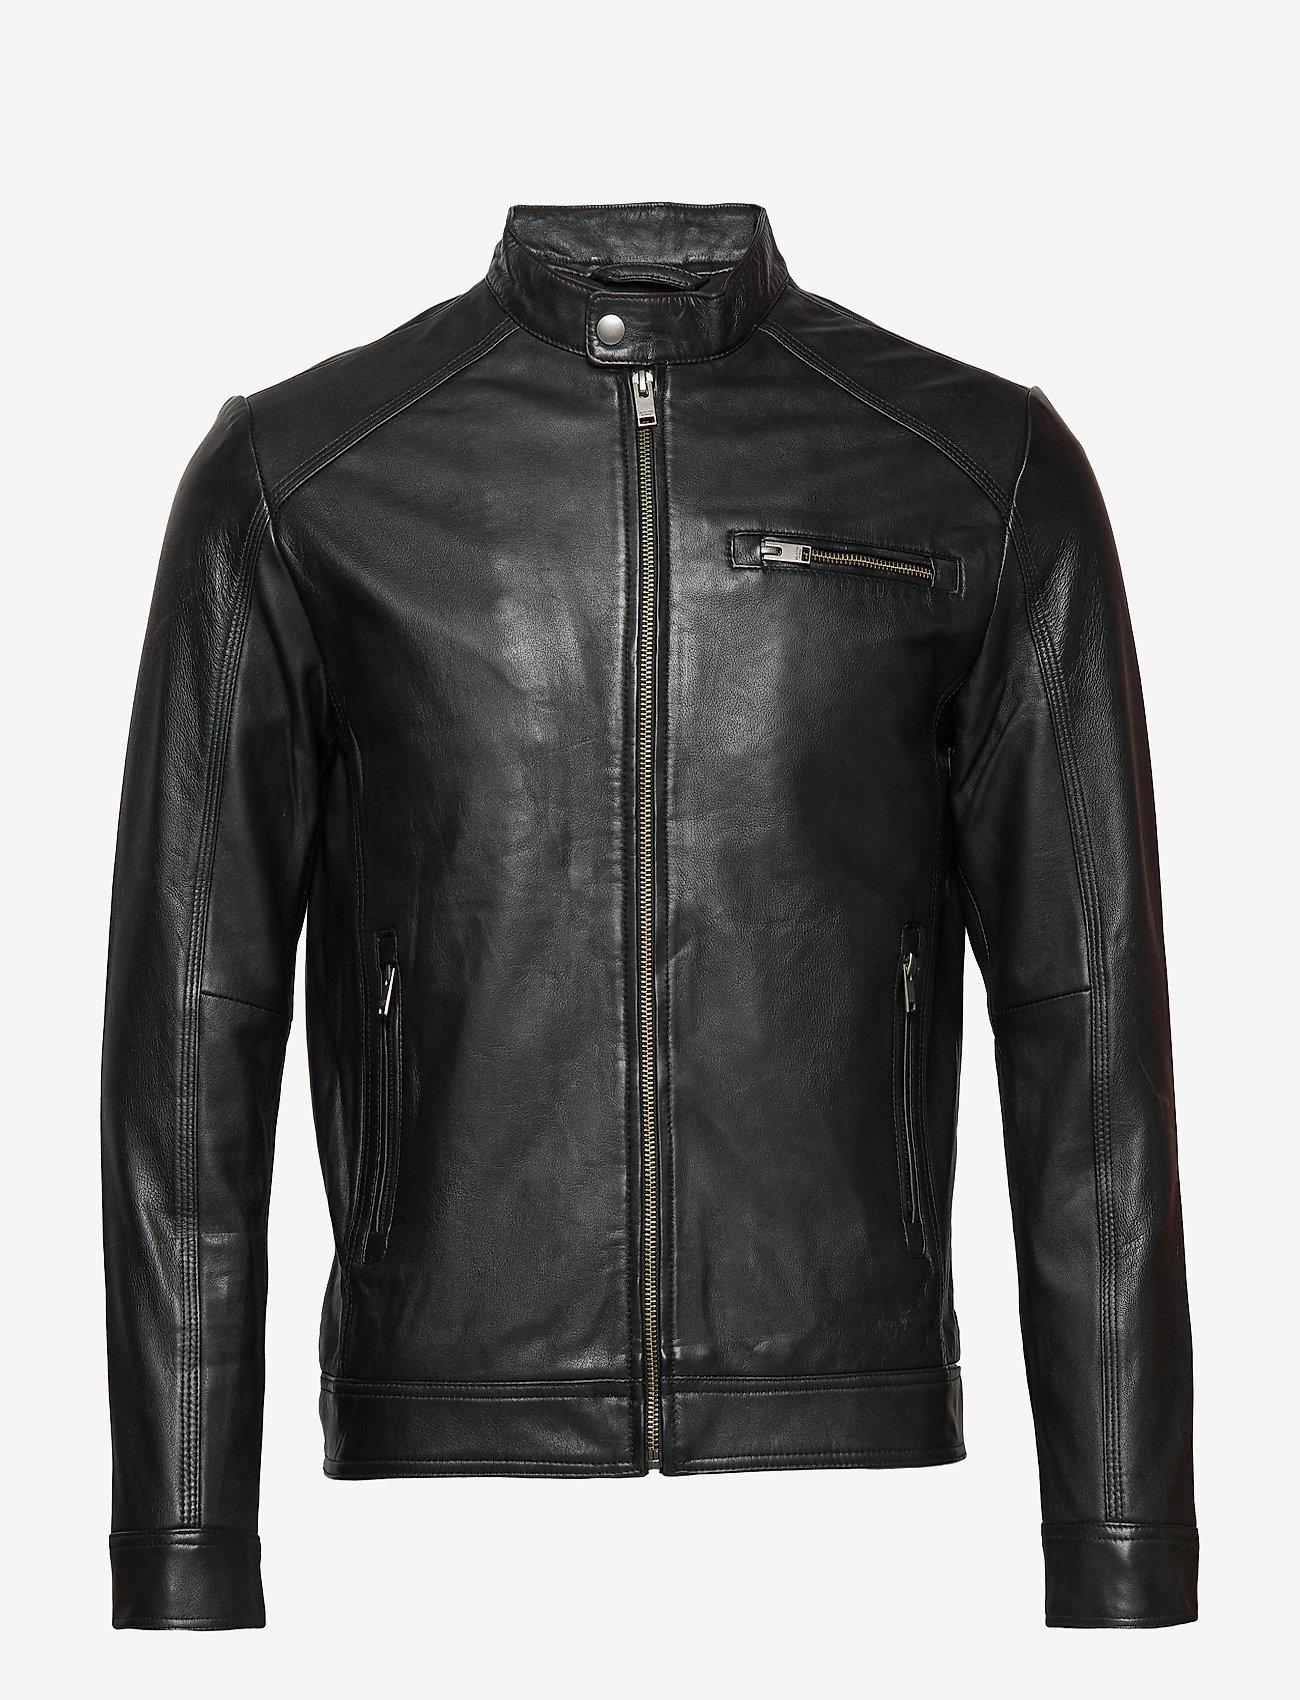 Selected Homme - SLH C-01 CLASSIC LEATHER JACKET W NOOS - lederjacken - black - 0